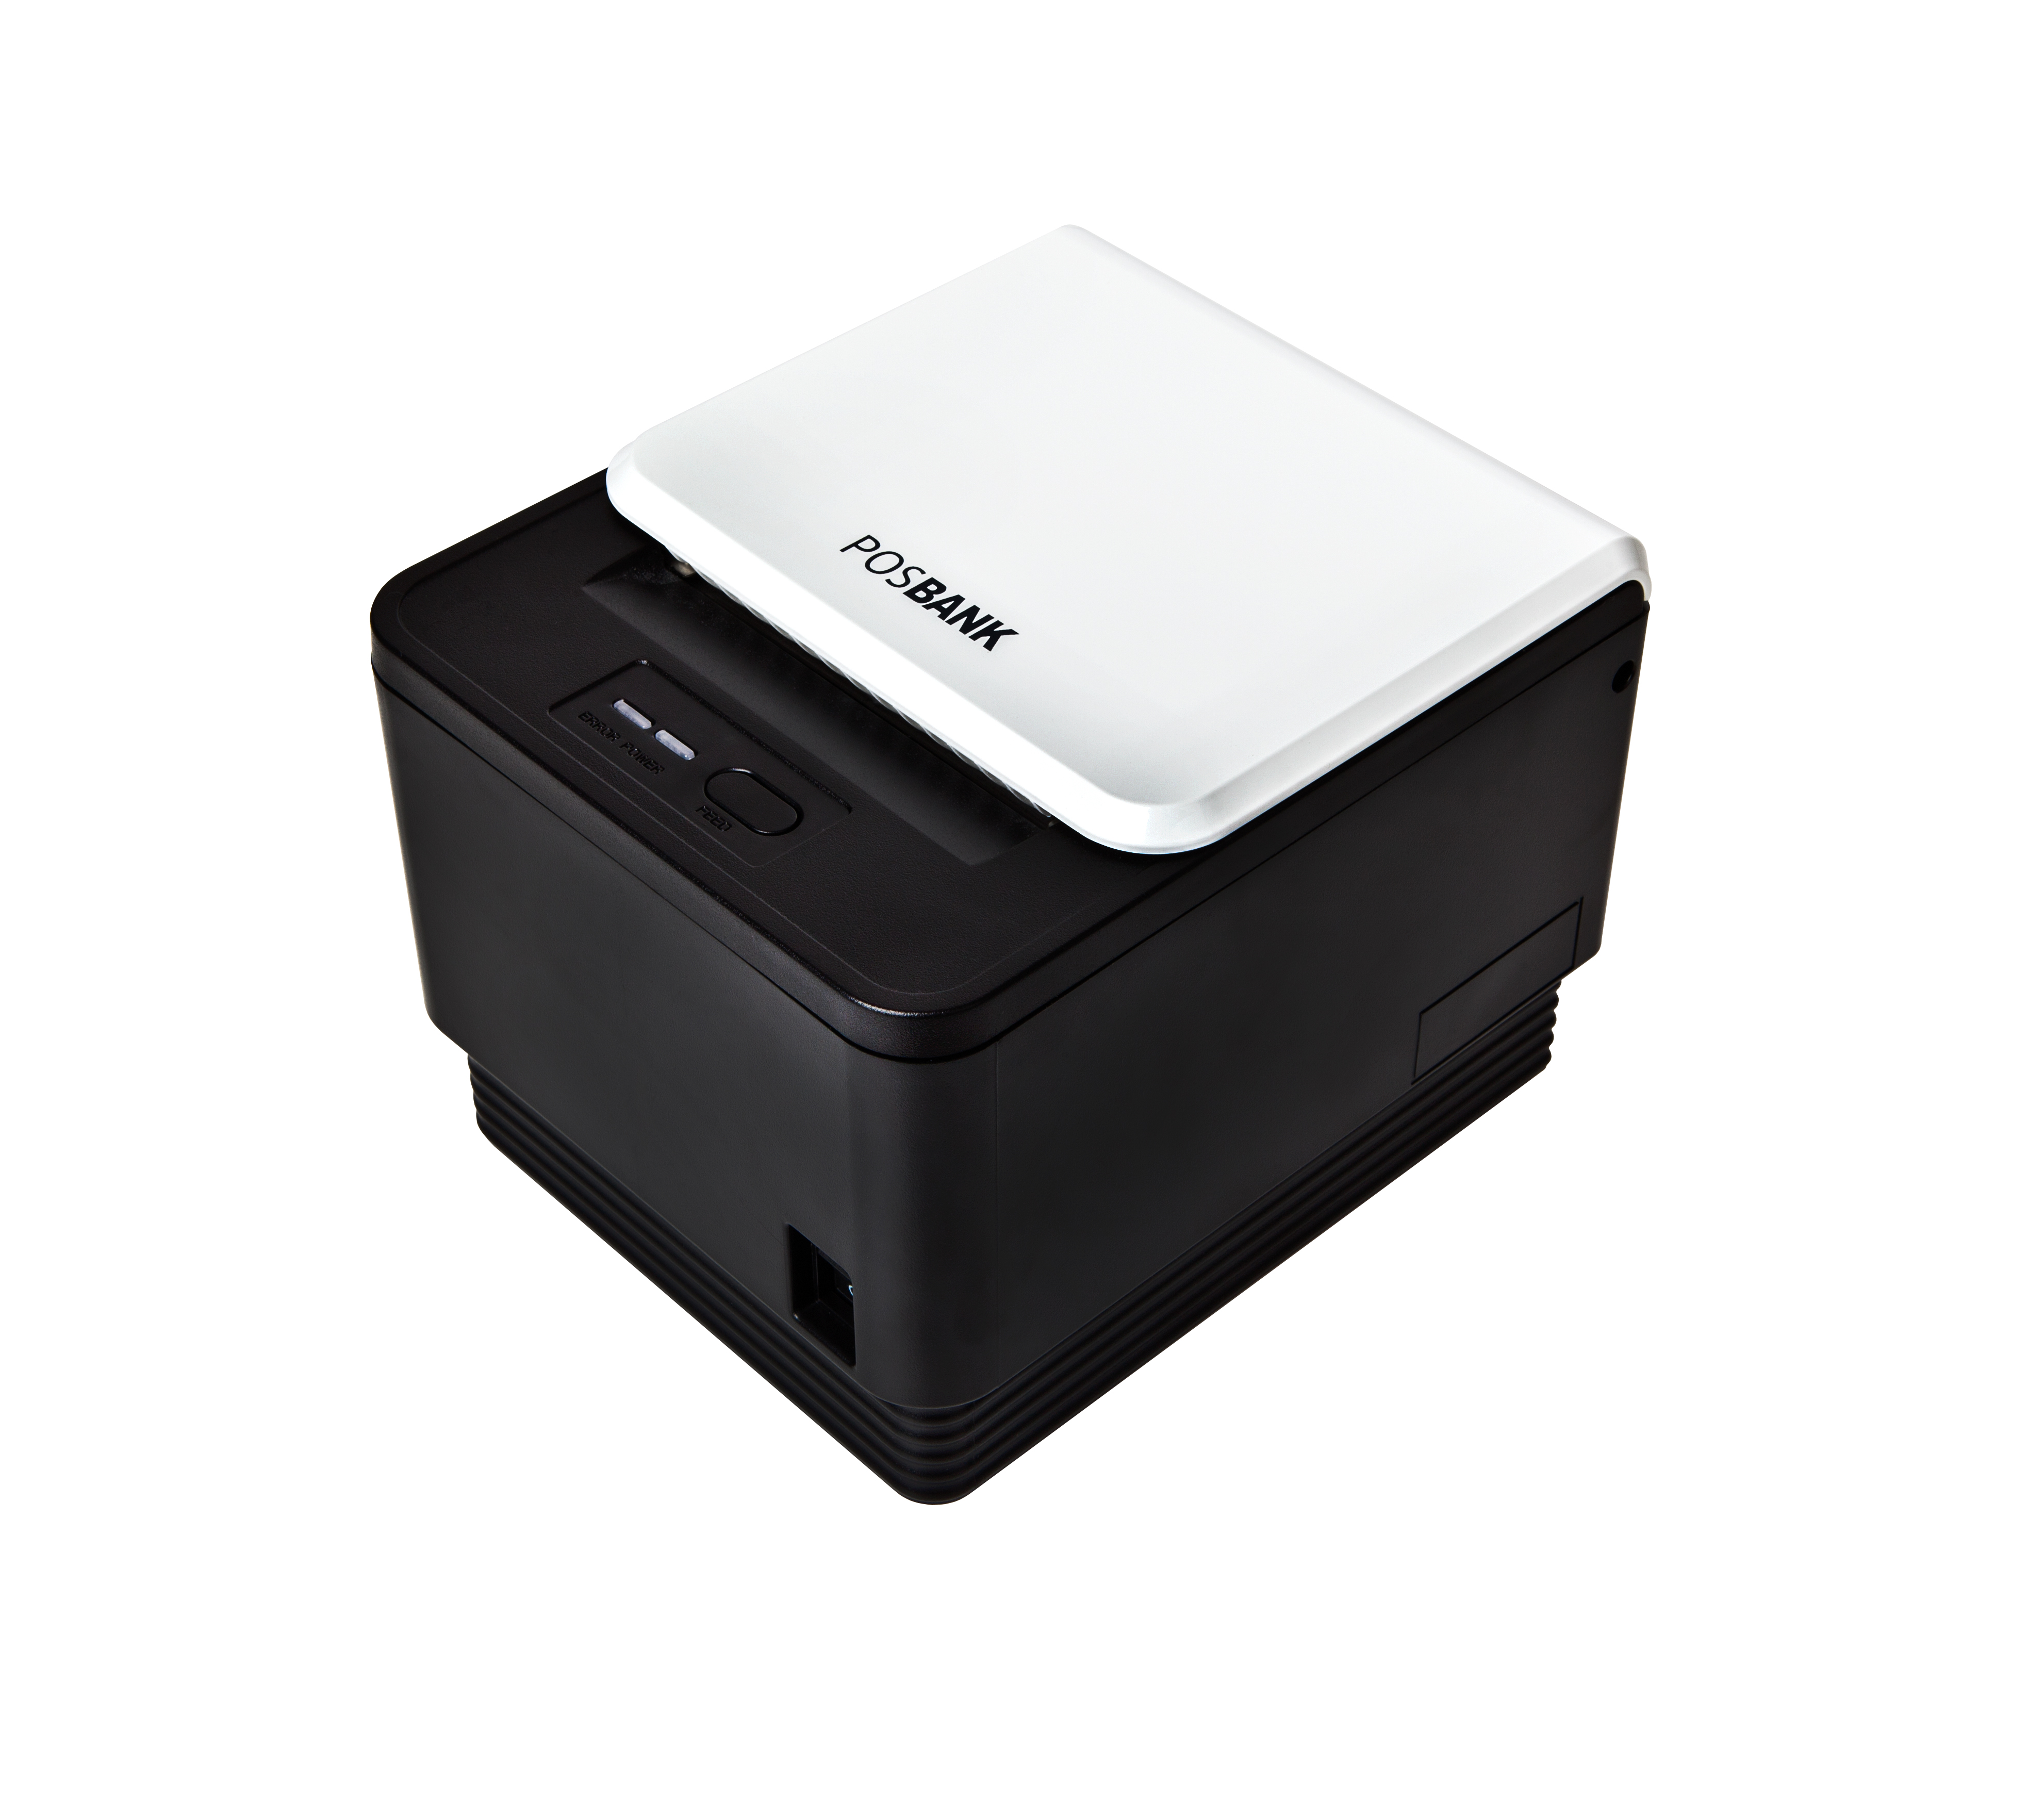 posbank-A7-receipt-printer-003.jpg